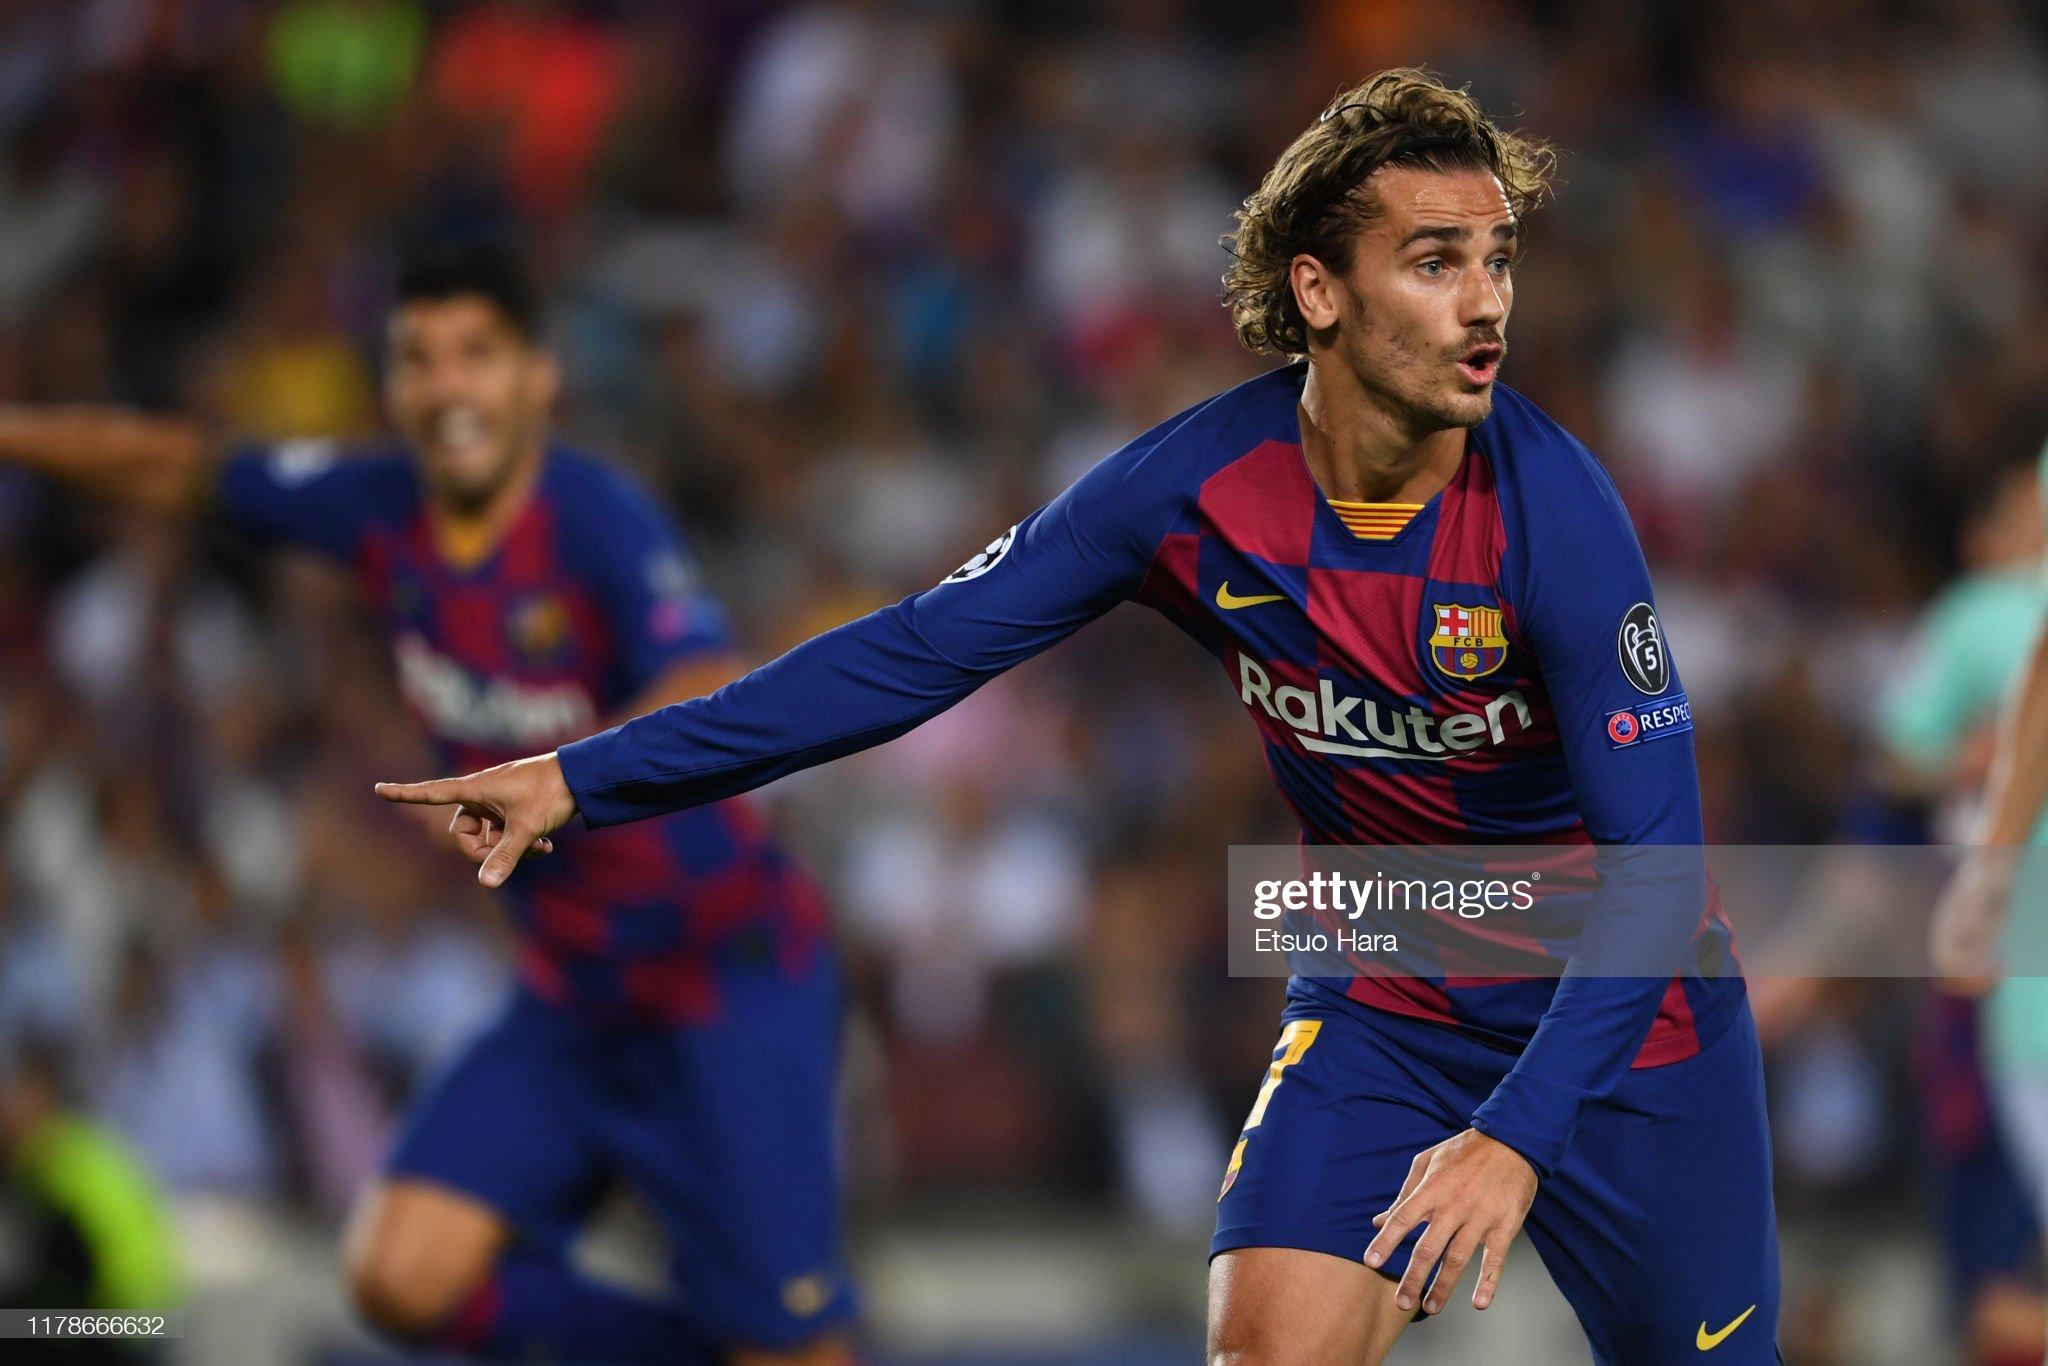 صور مباراة : برشلونة - إنتر 2-1 ( 02-10-2019 )  Antoine-griezmann-of-fc-barcelona-in-action-during-the-uefa-champions-picture-id1178666632?s=2048x2048